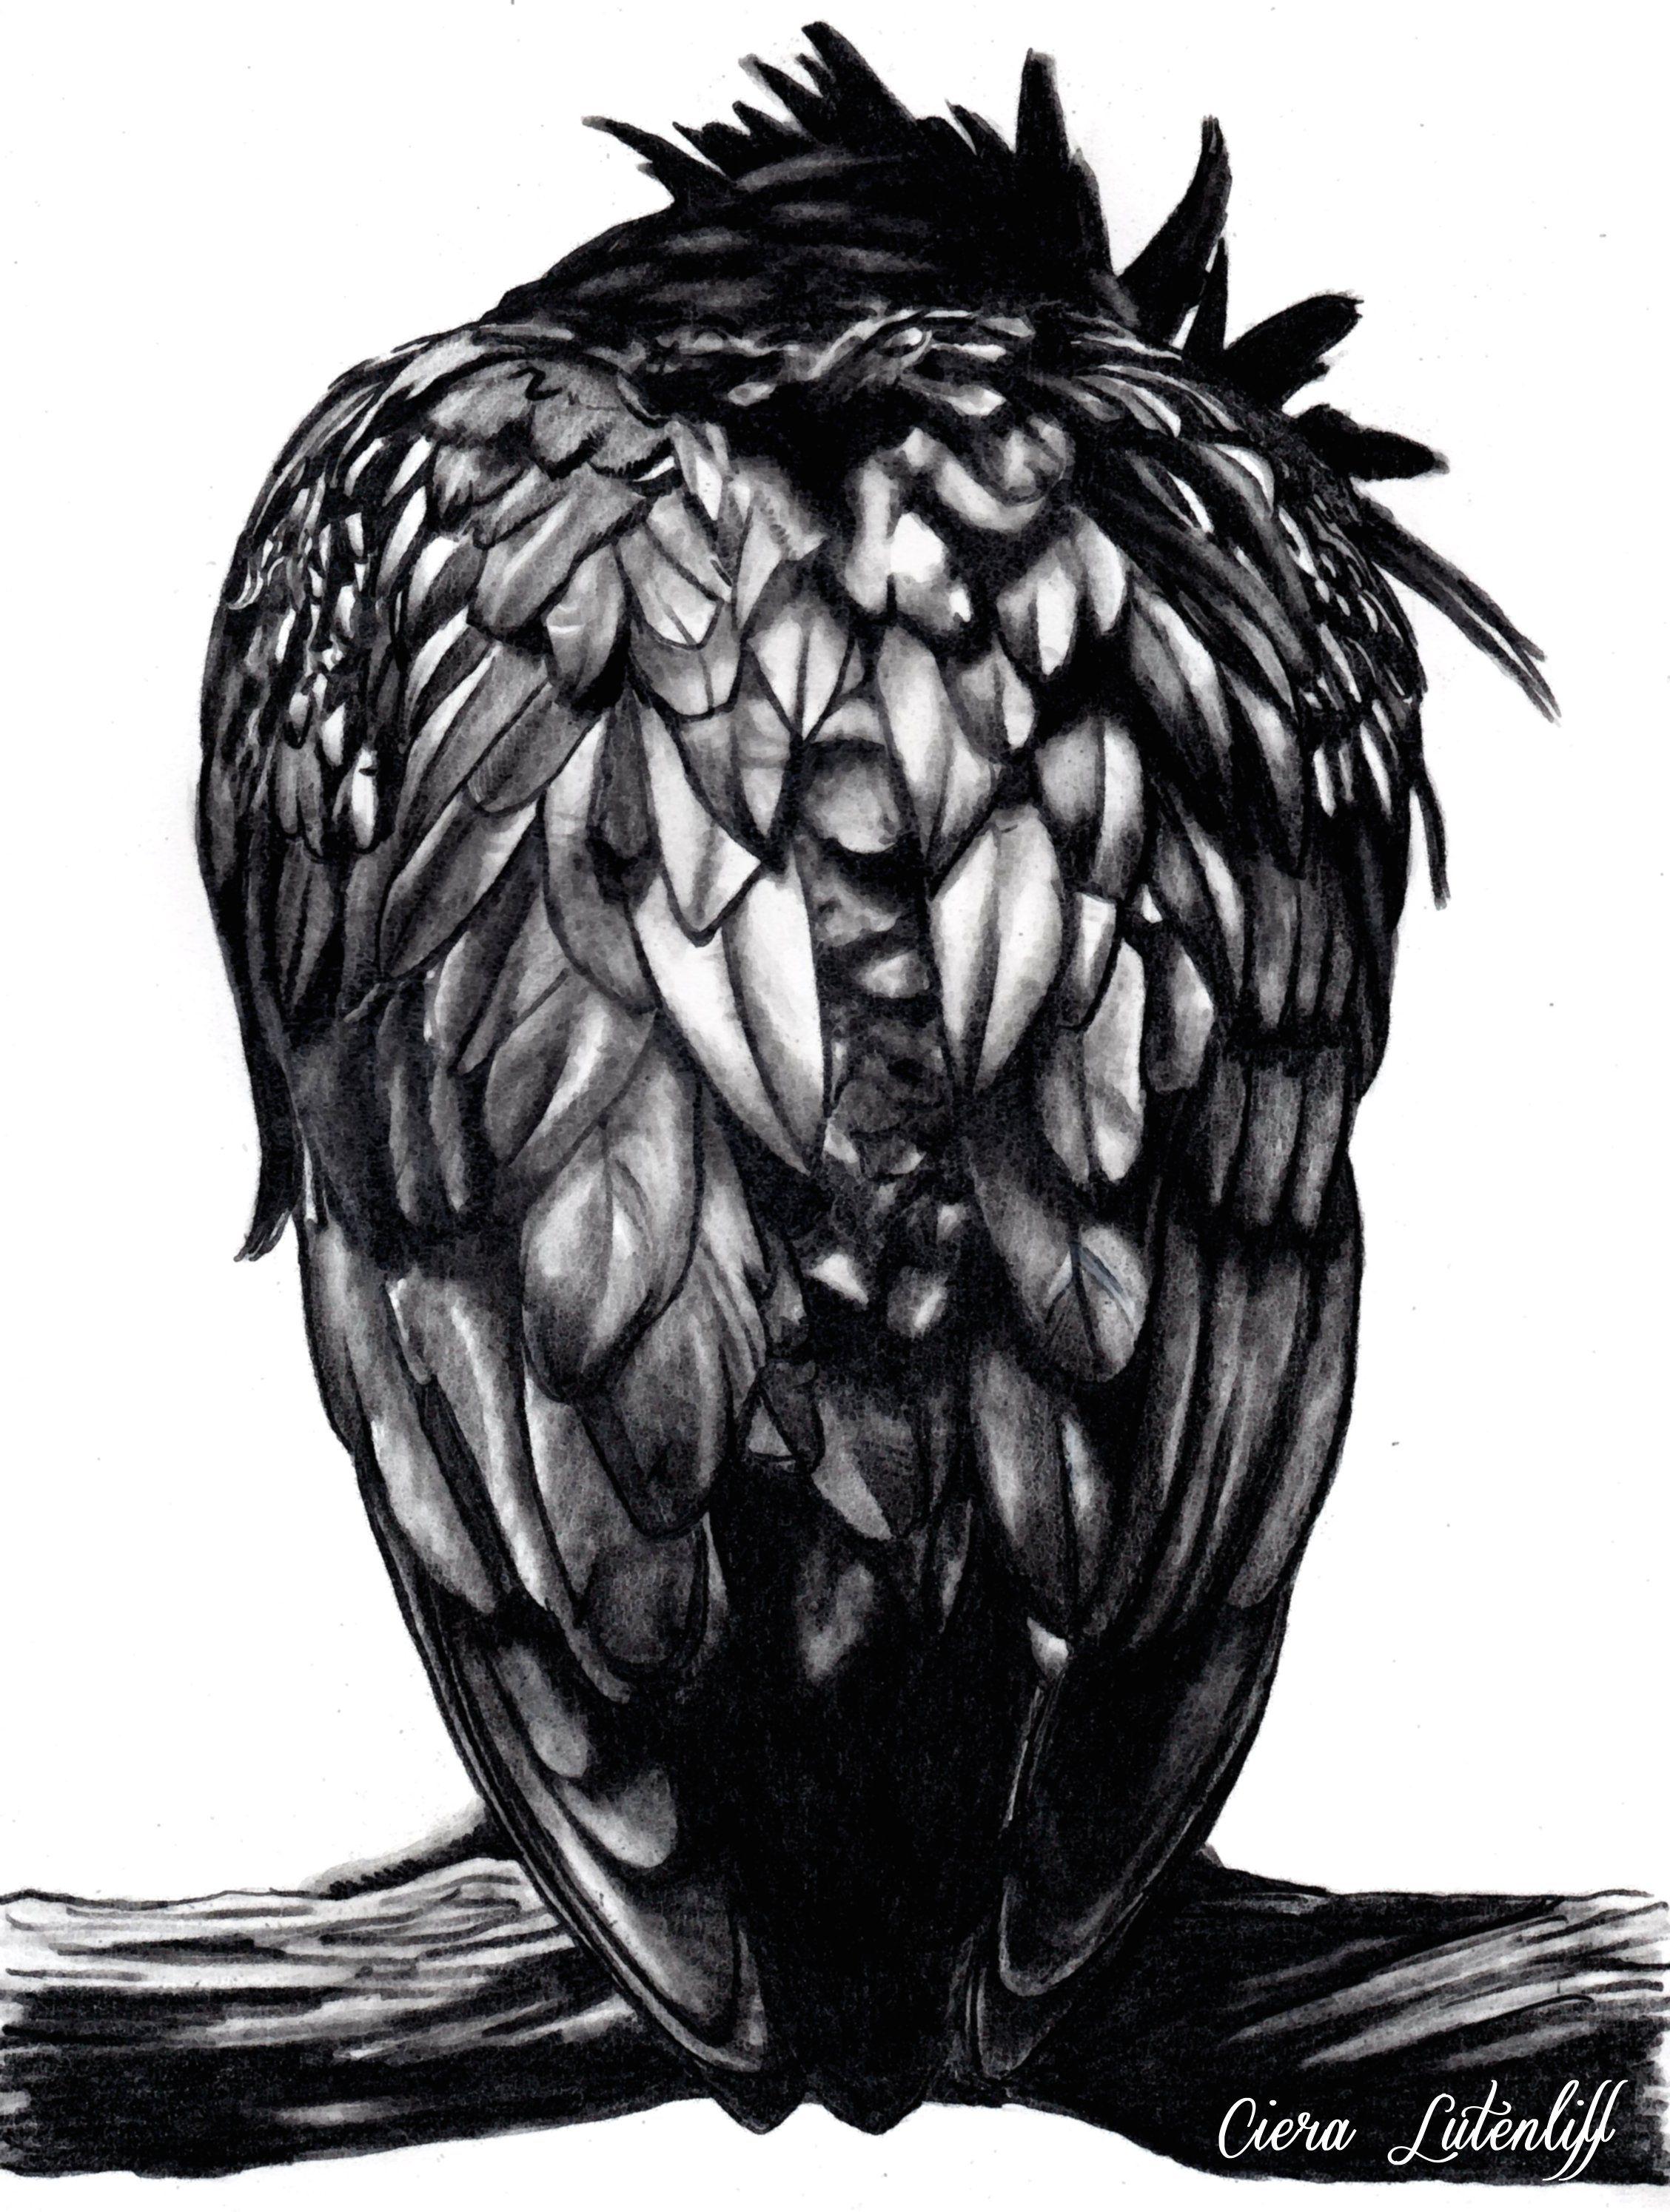 Corbeau Raven Crow   Corbeau, Dessin couleur, Dessin